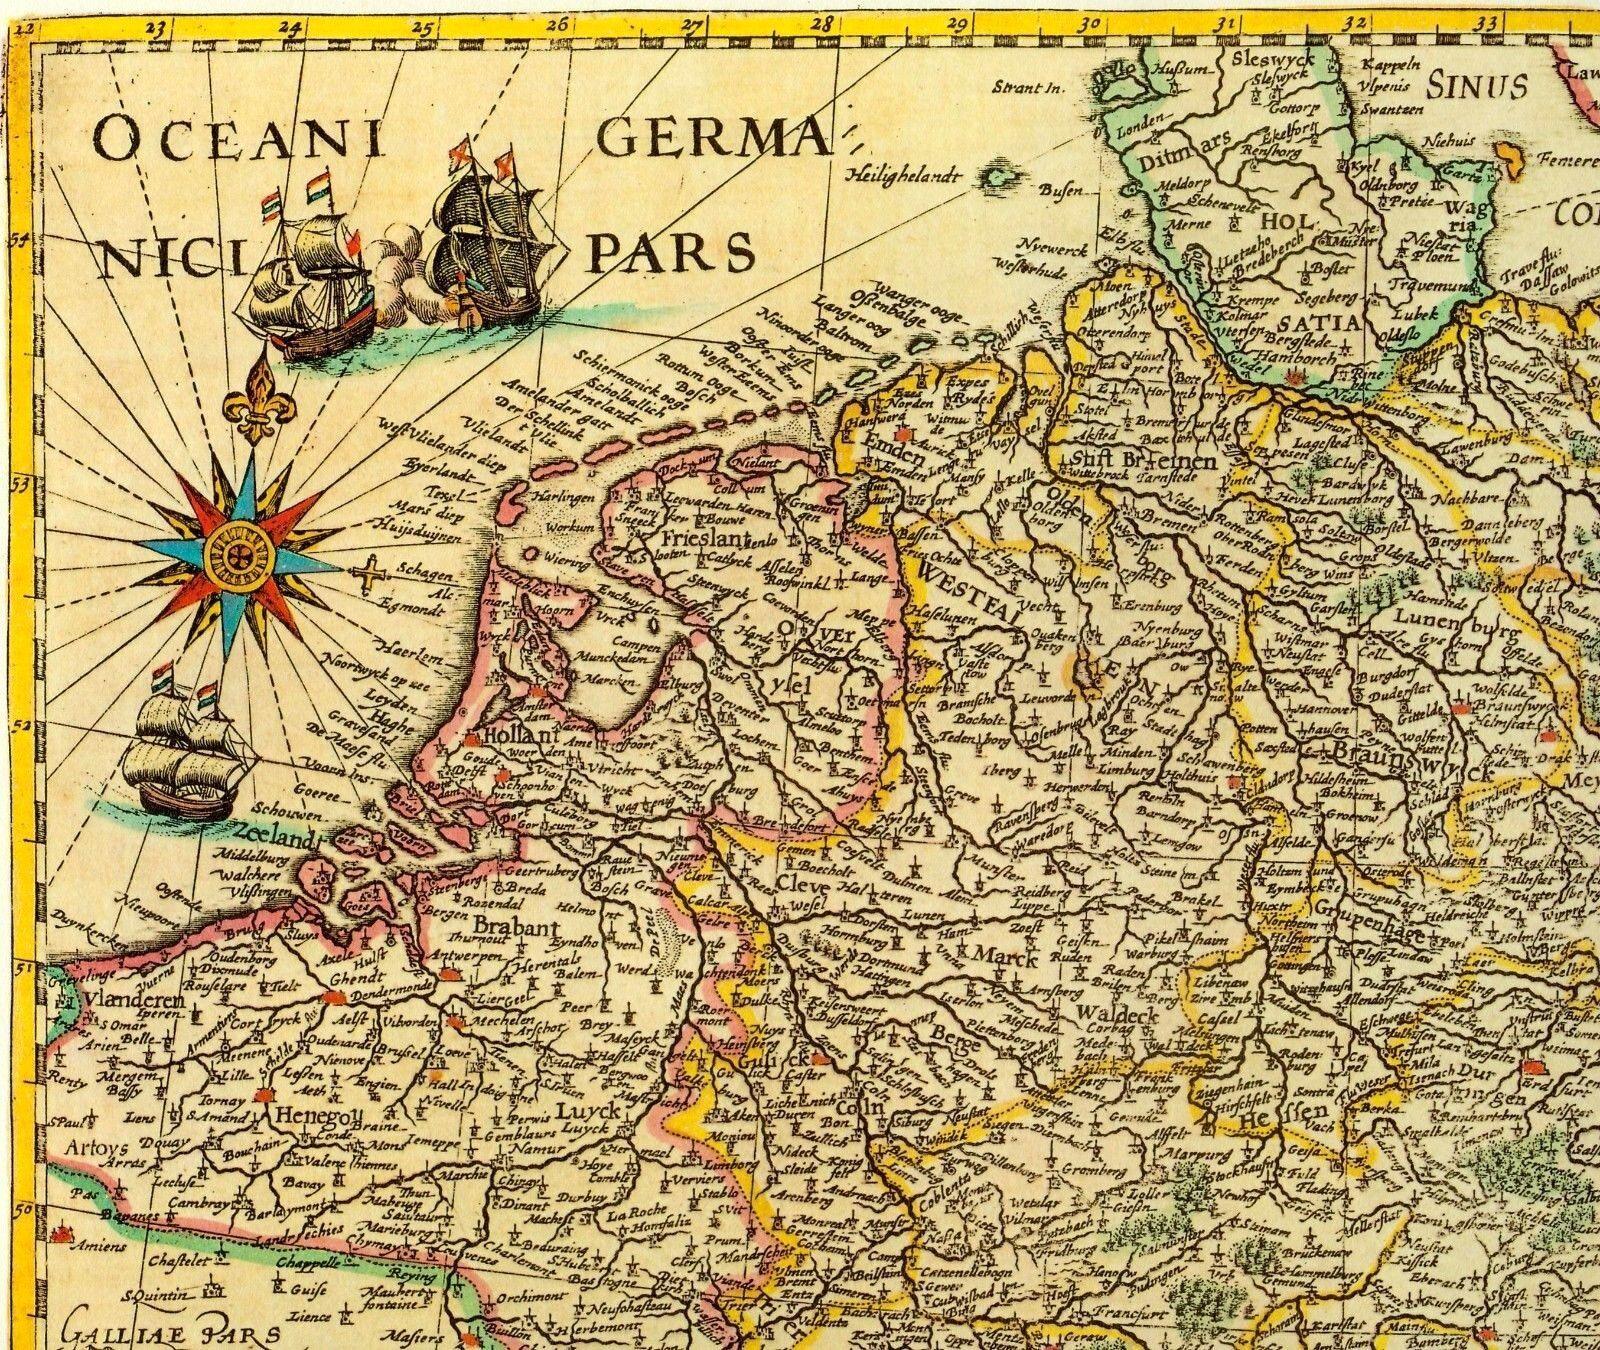 historische landkarte ostfriesland friesland oldenburg jever emden aurich 1658 eur 25 00. Black Bedroom Furniture Sets. Home Design Ideas